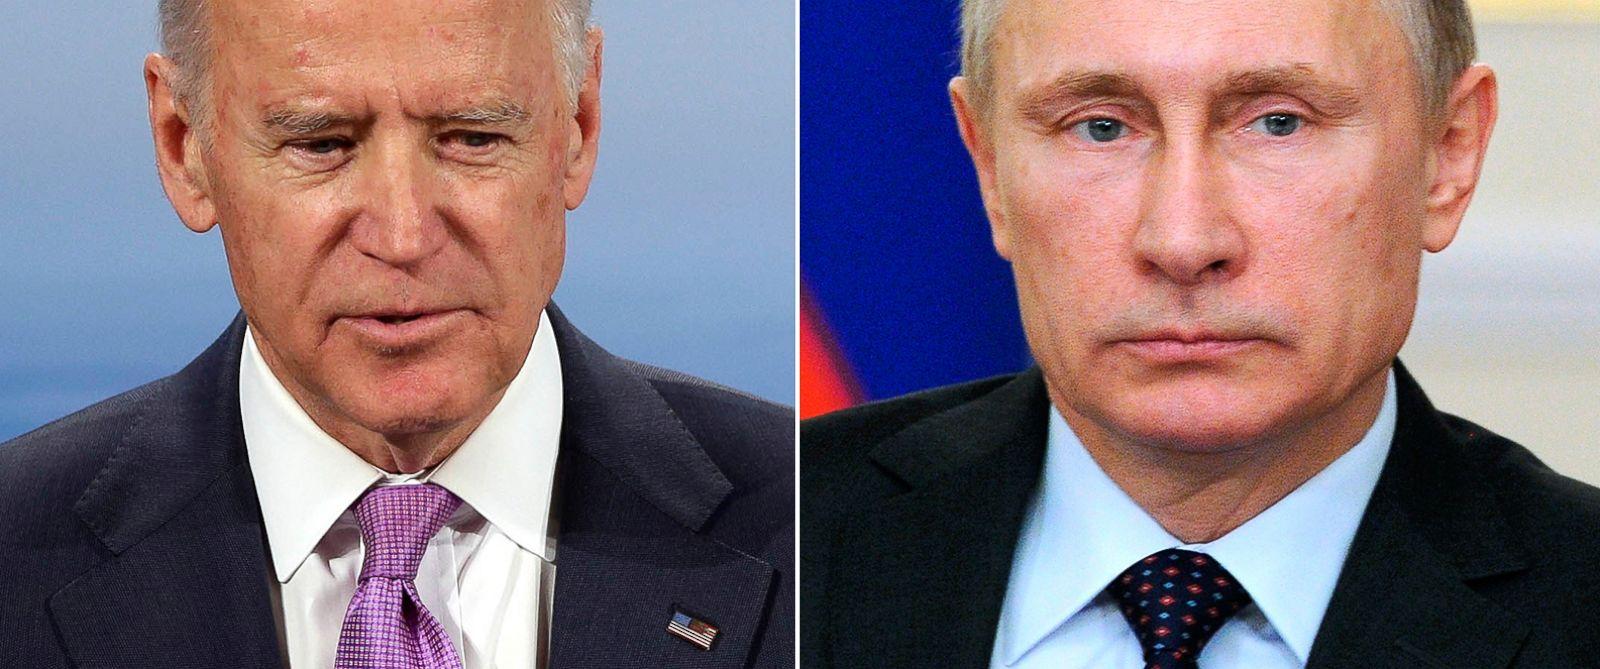 PHOTO: Vice President Joe Biden in Munich, Germany, Feb. 7, 2015. | Russian President Vladimir Putin in the Novo-Ogaryovo residence, outside Moscow, Russia, Feb. 4, 2015.